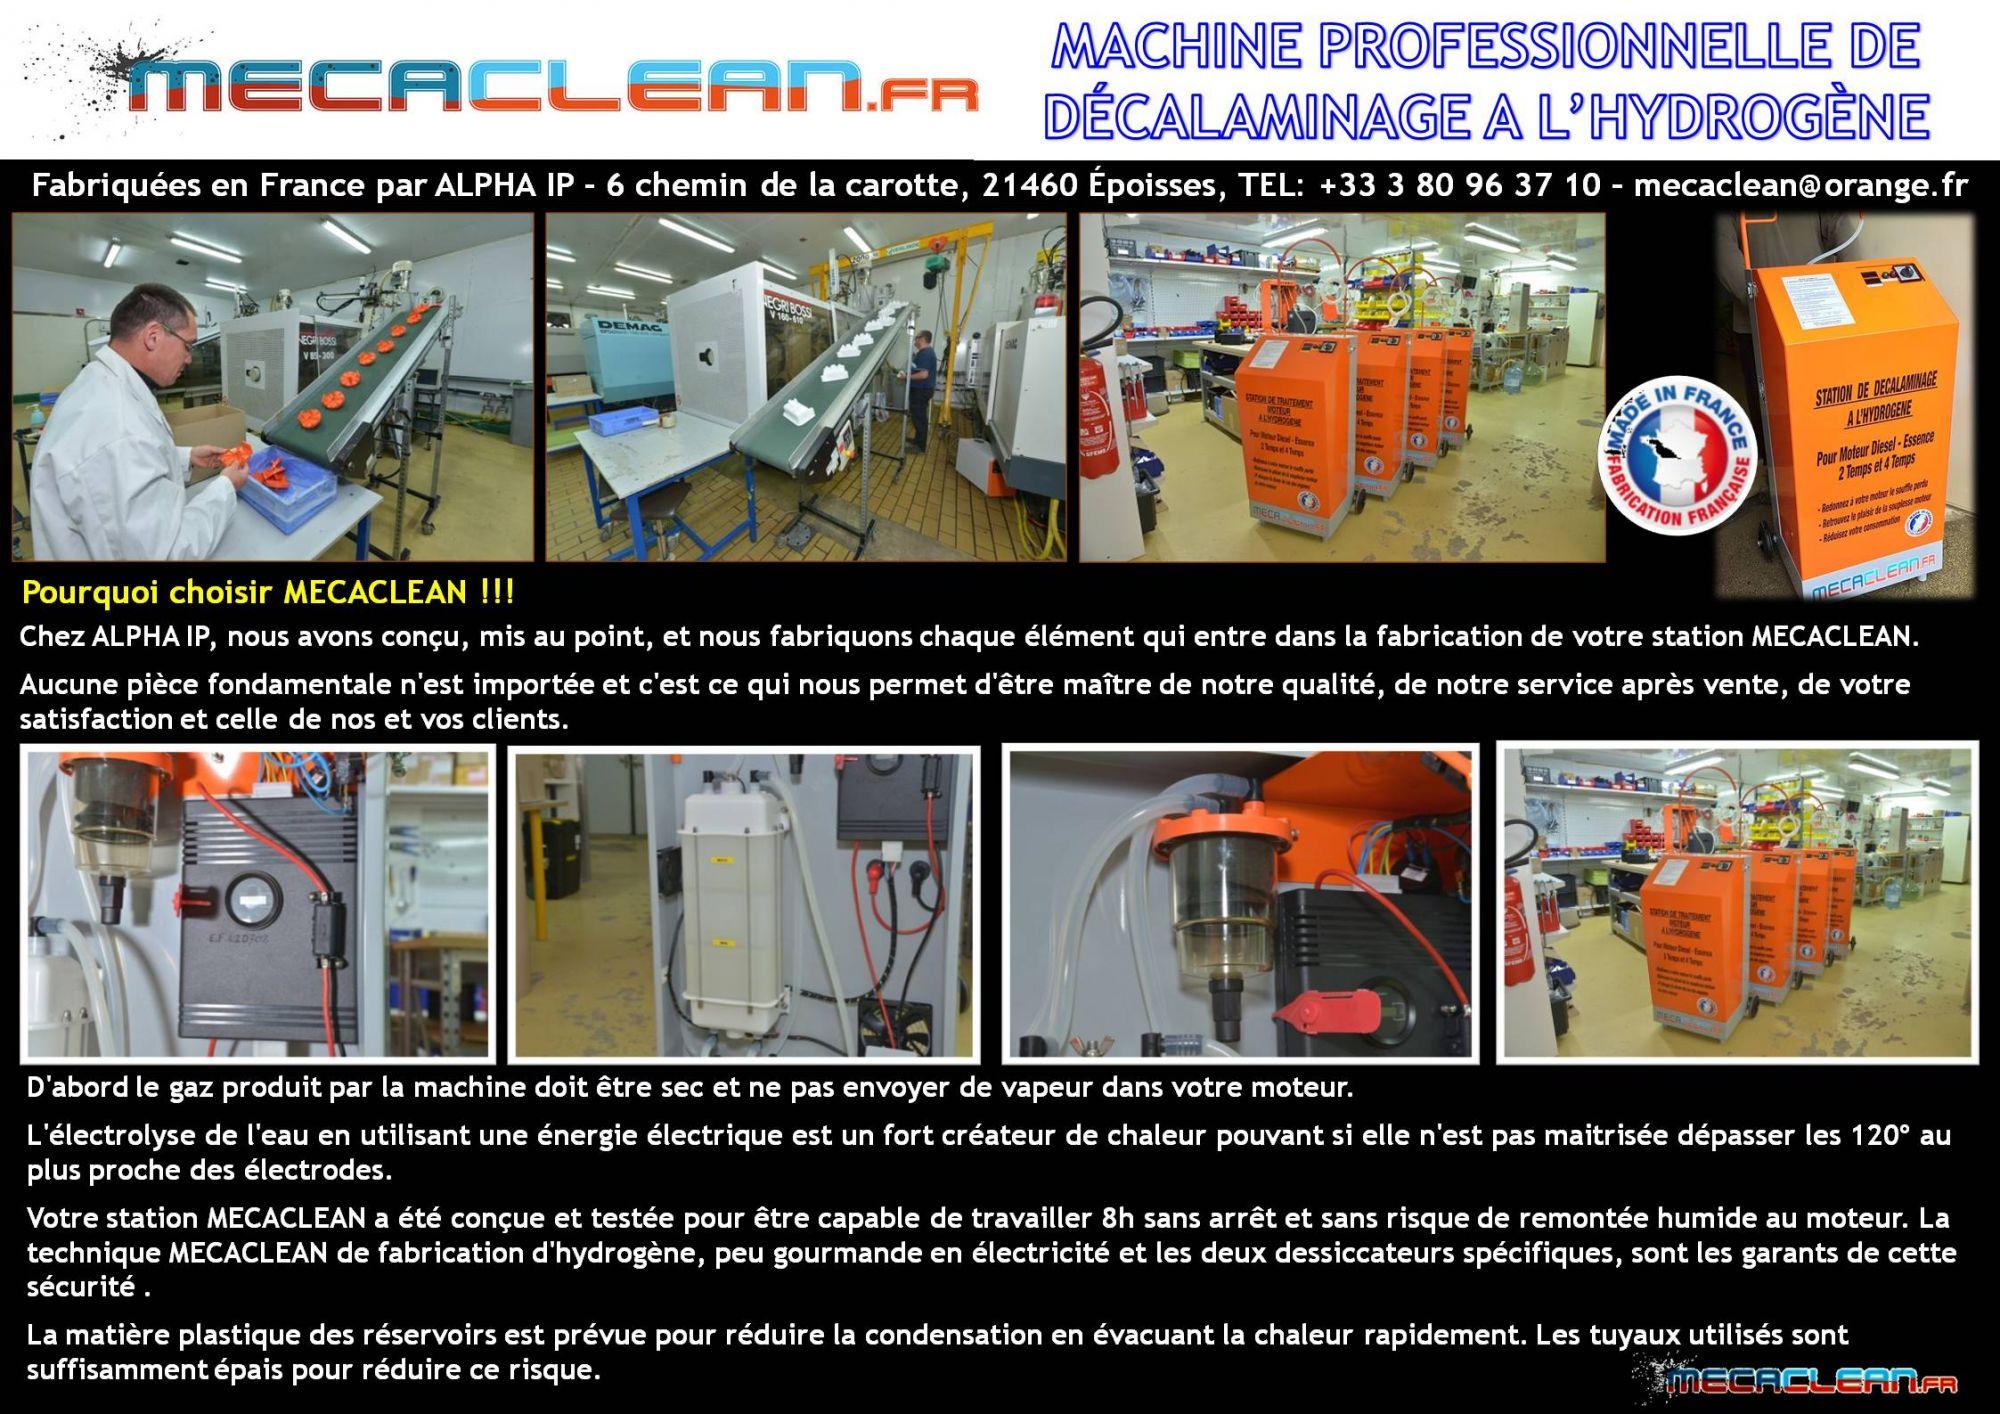 distributeur-mecaclean-2-jpeg